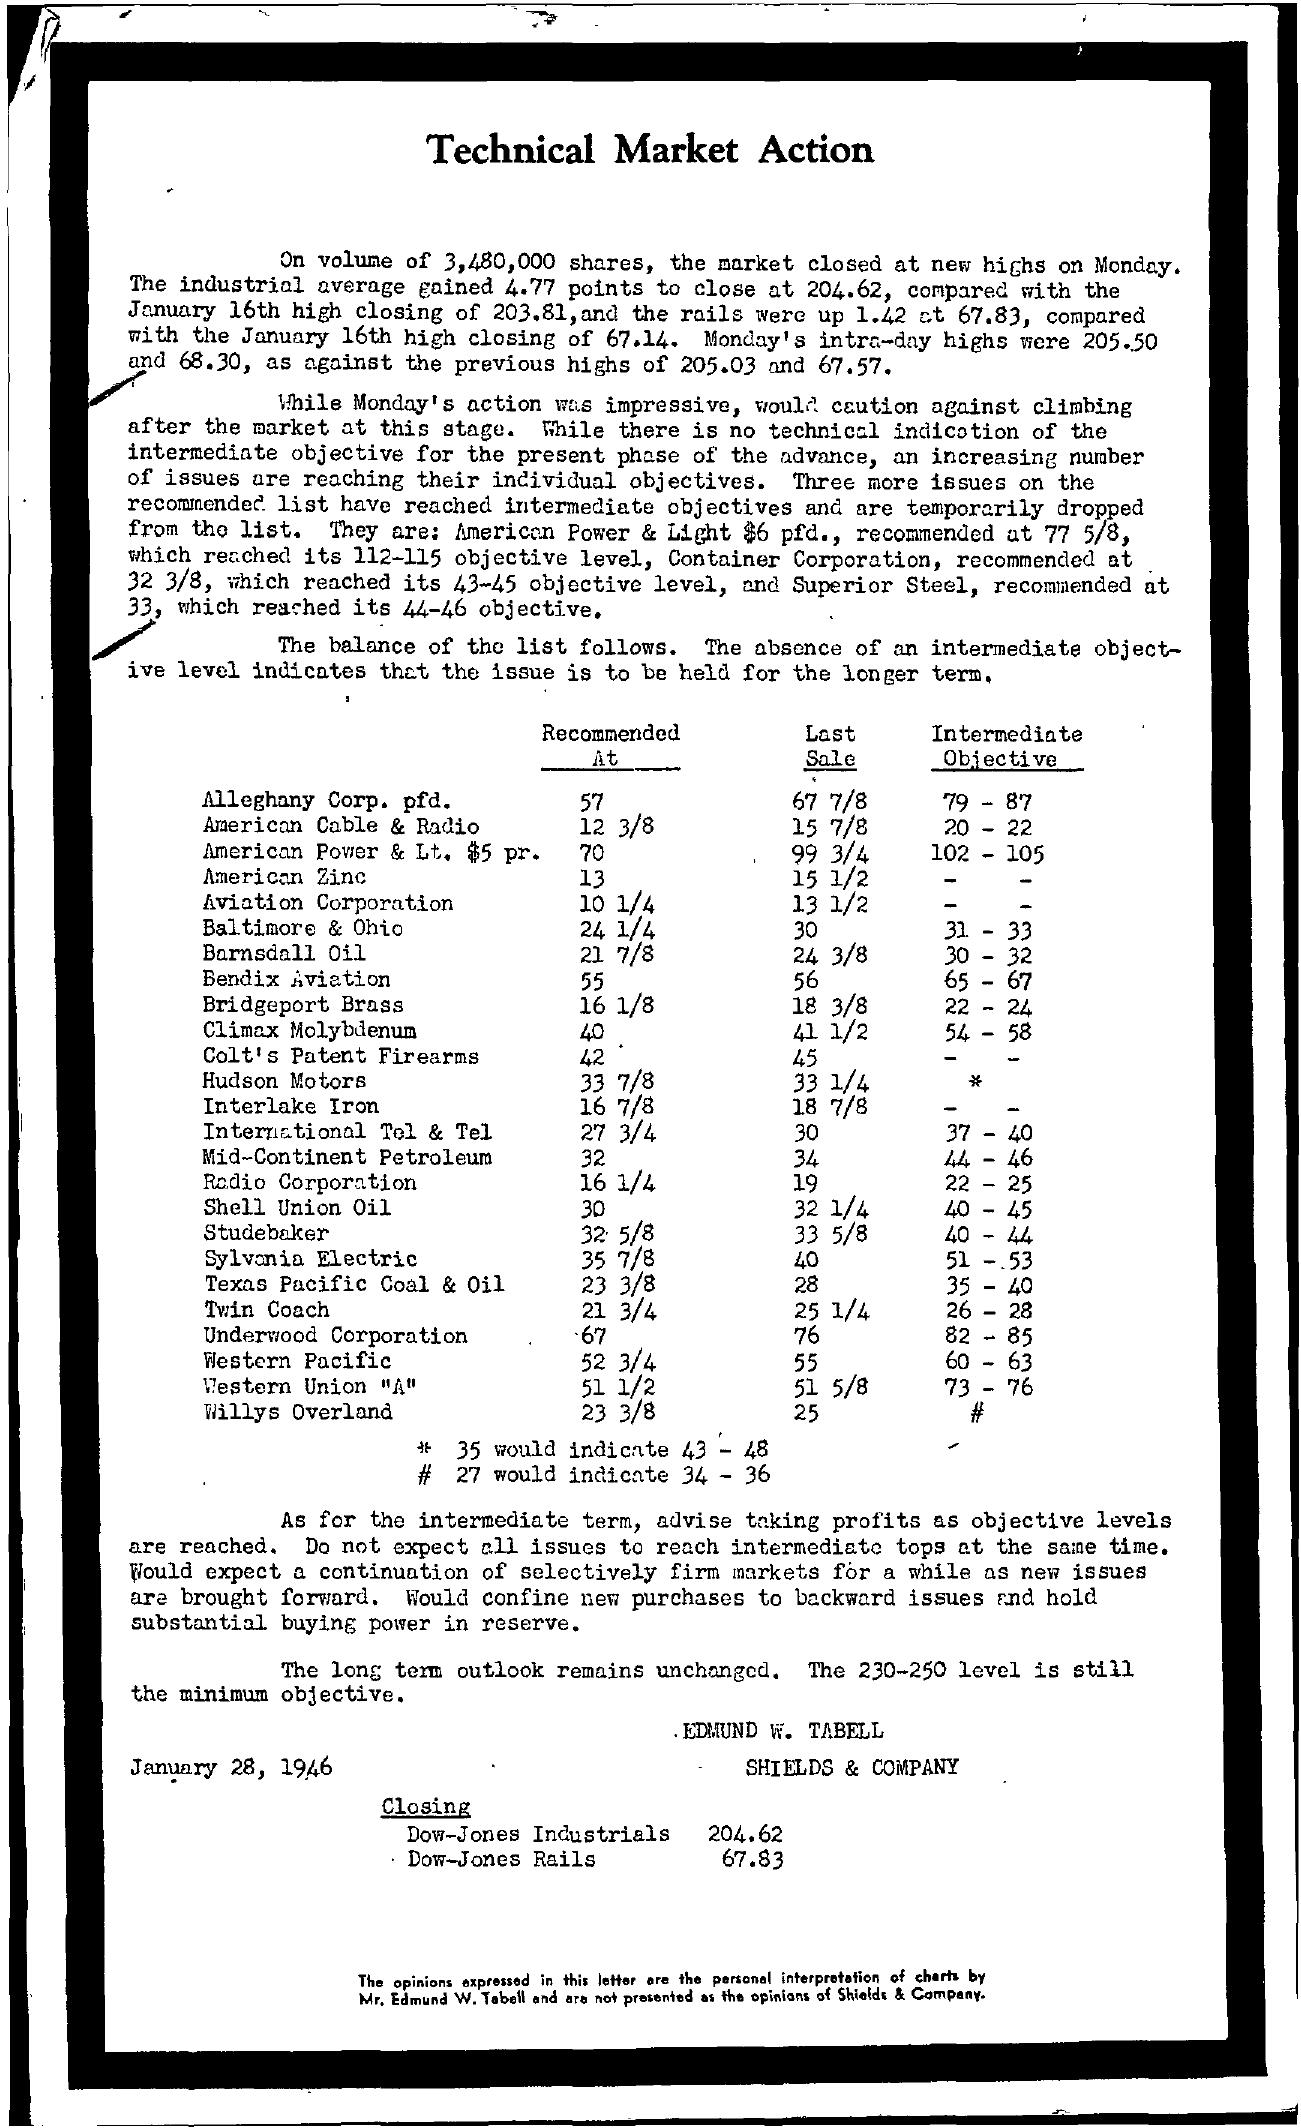 Tabell's Market Letter - January 28, 1946